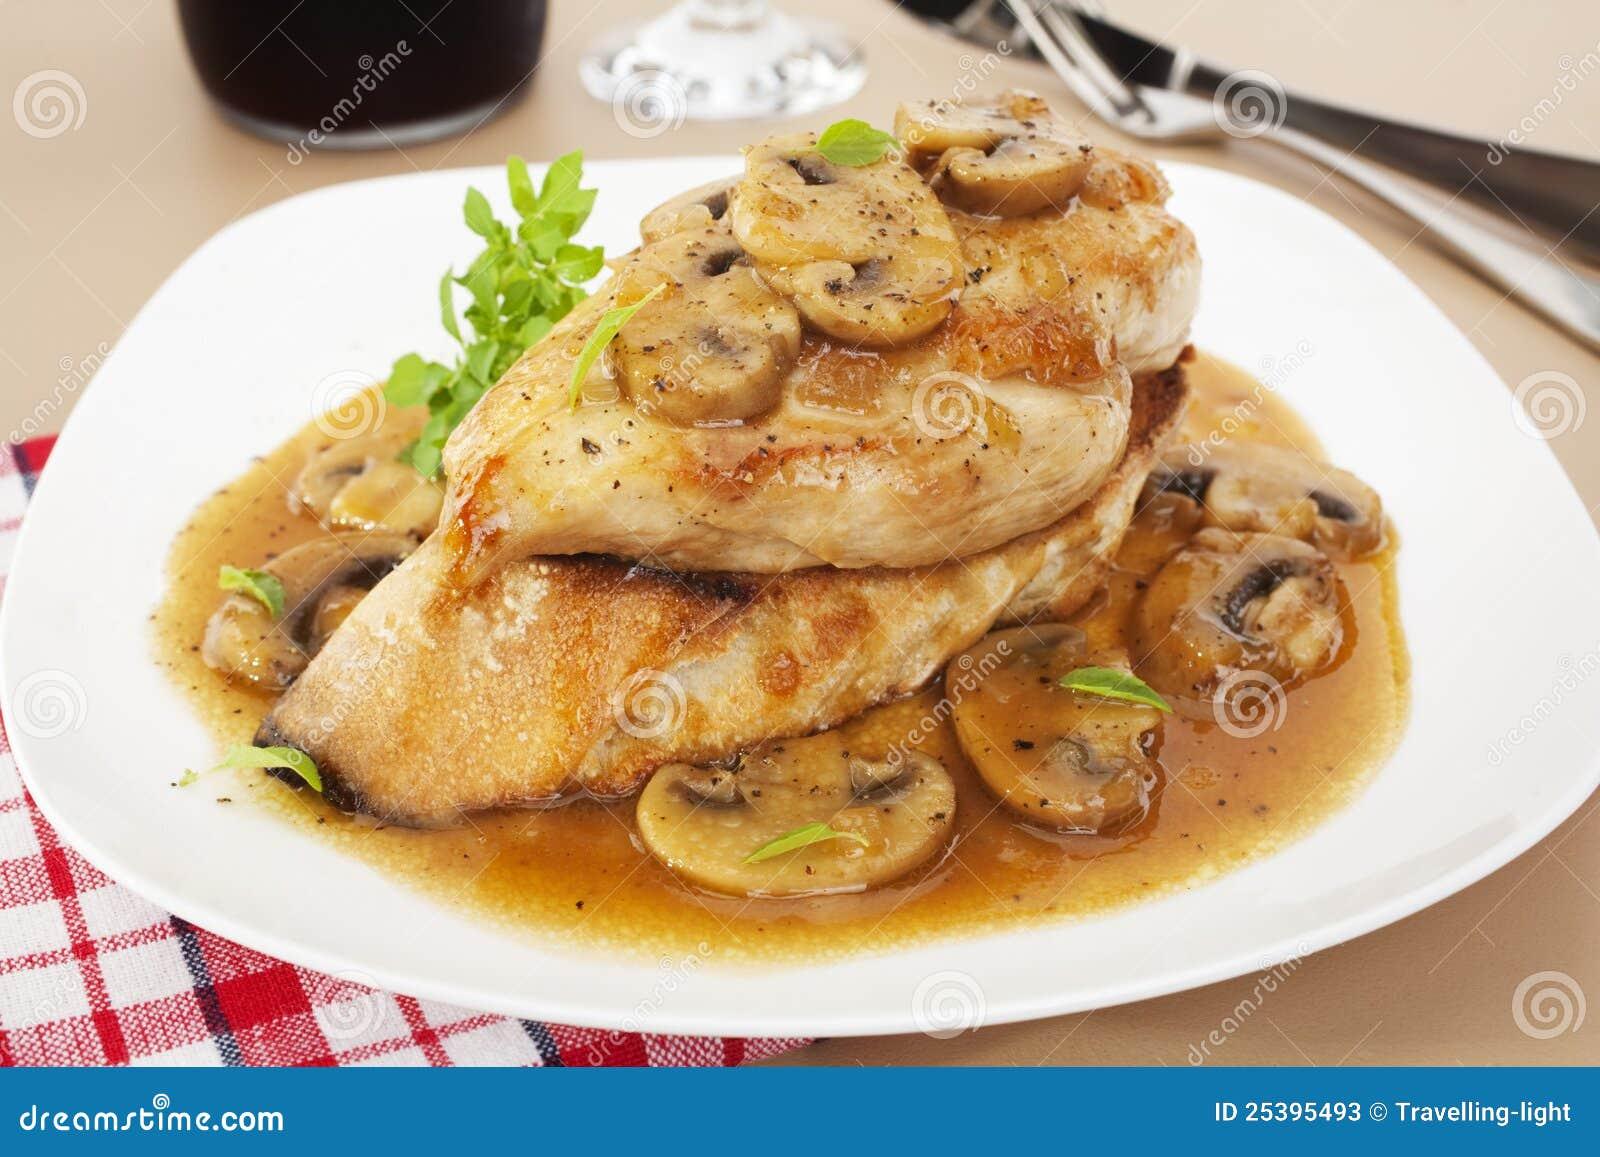 Chicken marsala italian food stock photos image 25395493 for American italian cuisine